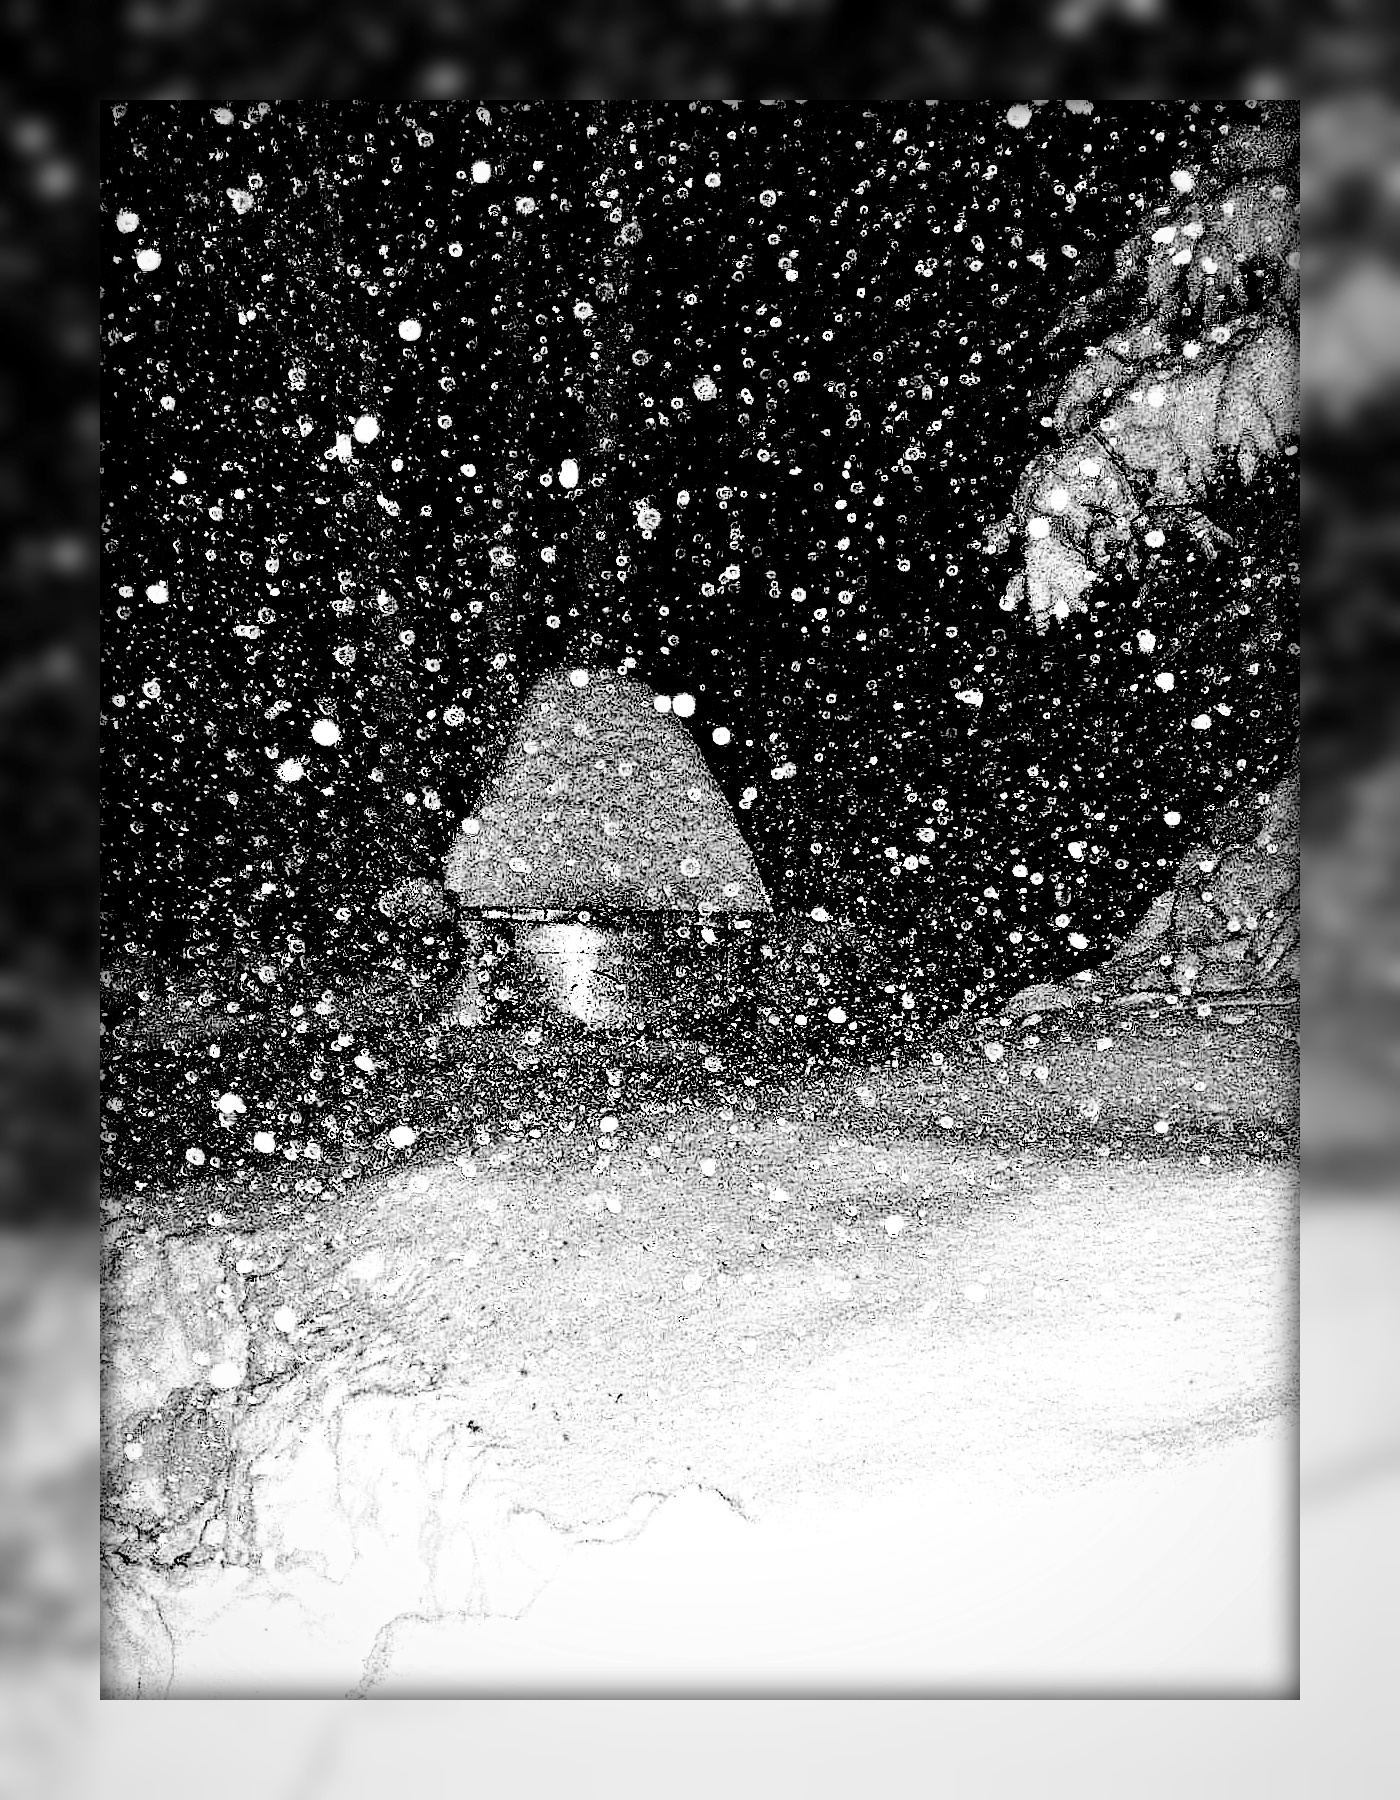 Gloomy Snow Fall by surrealistic-gloom